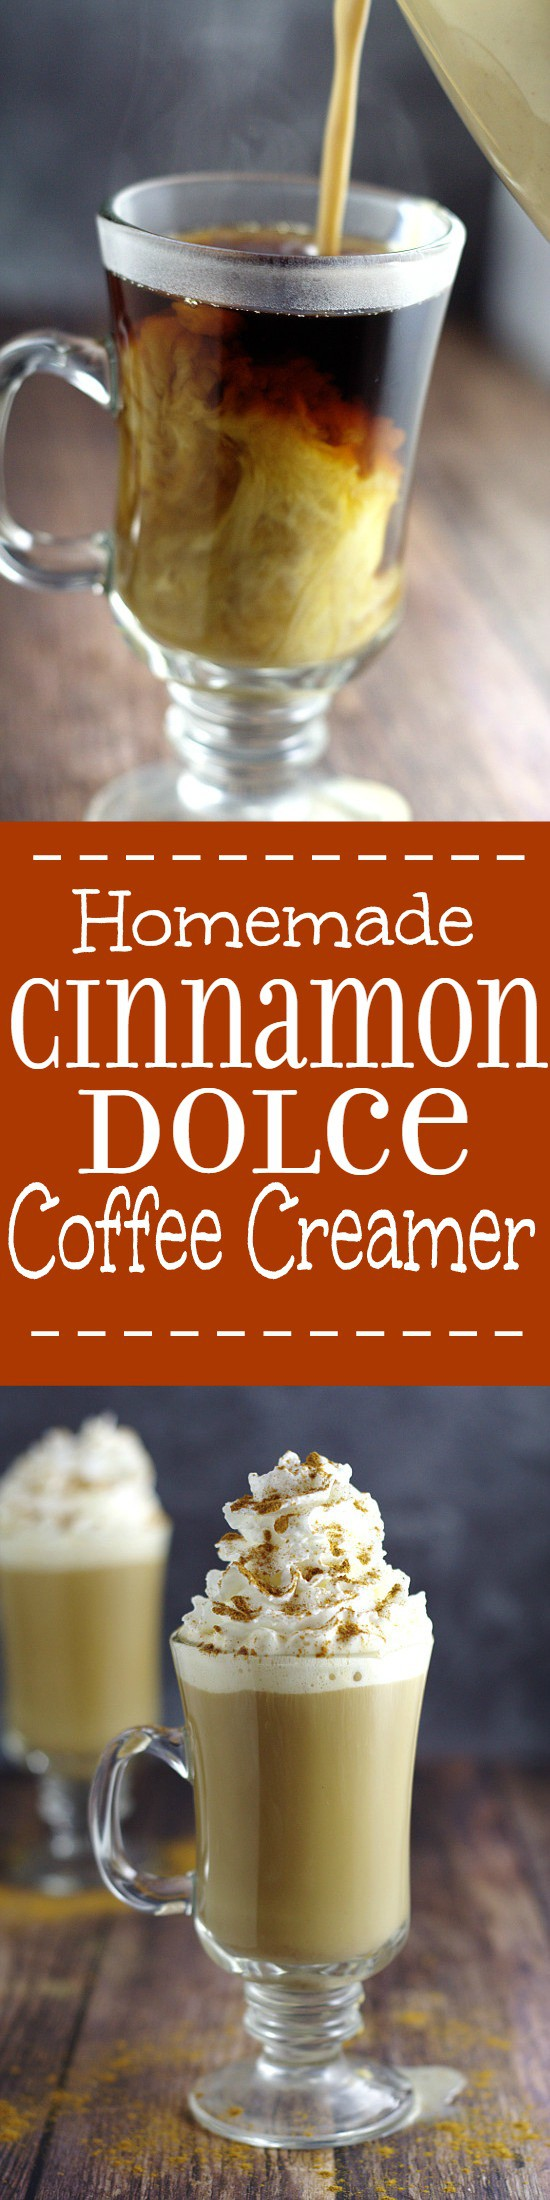 Homemade Cinnamon Dolce Coffee Creamer  The Gracious Wife-6119